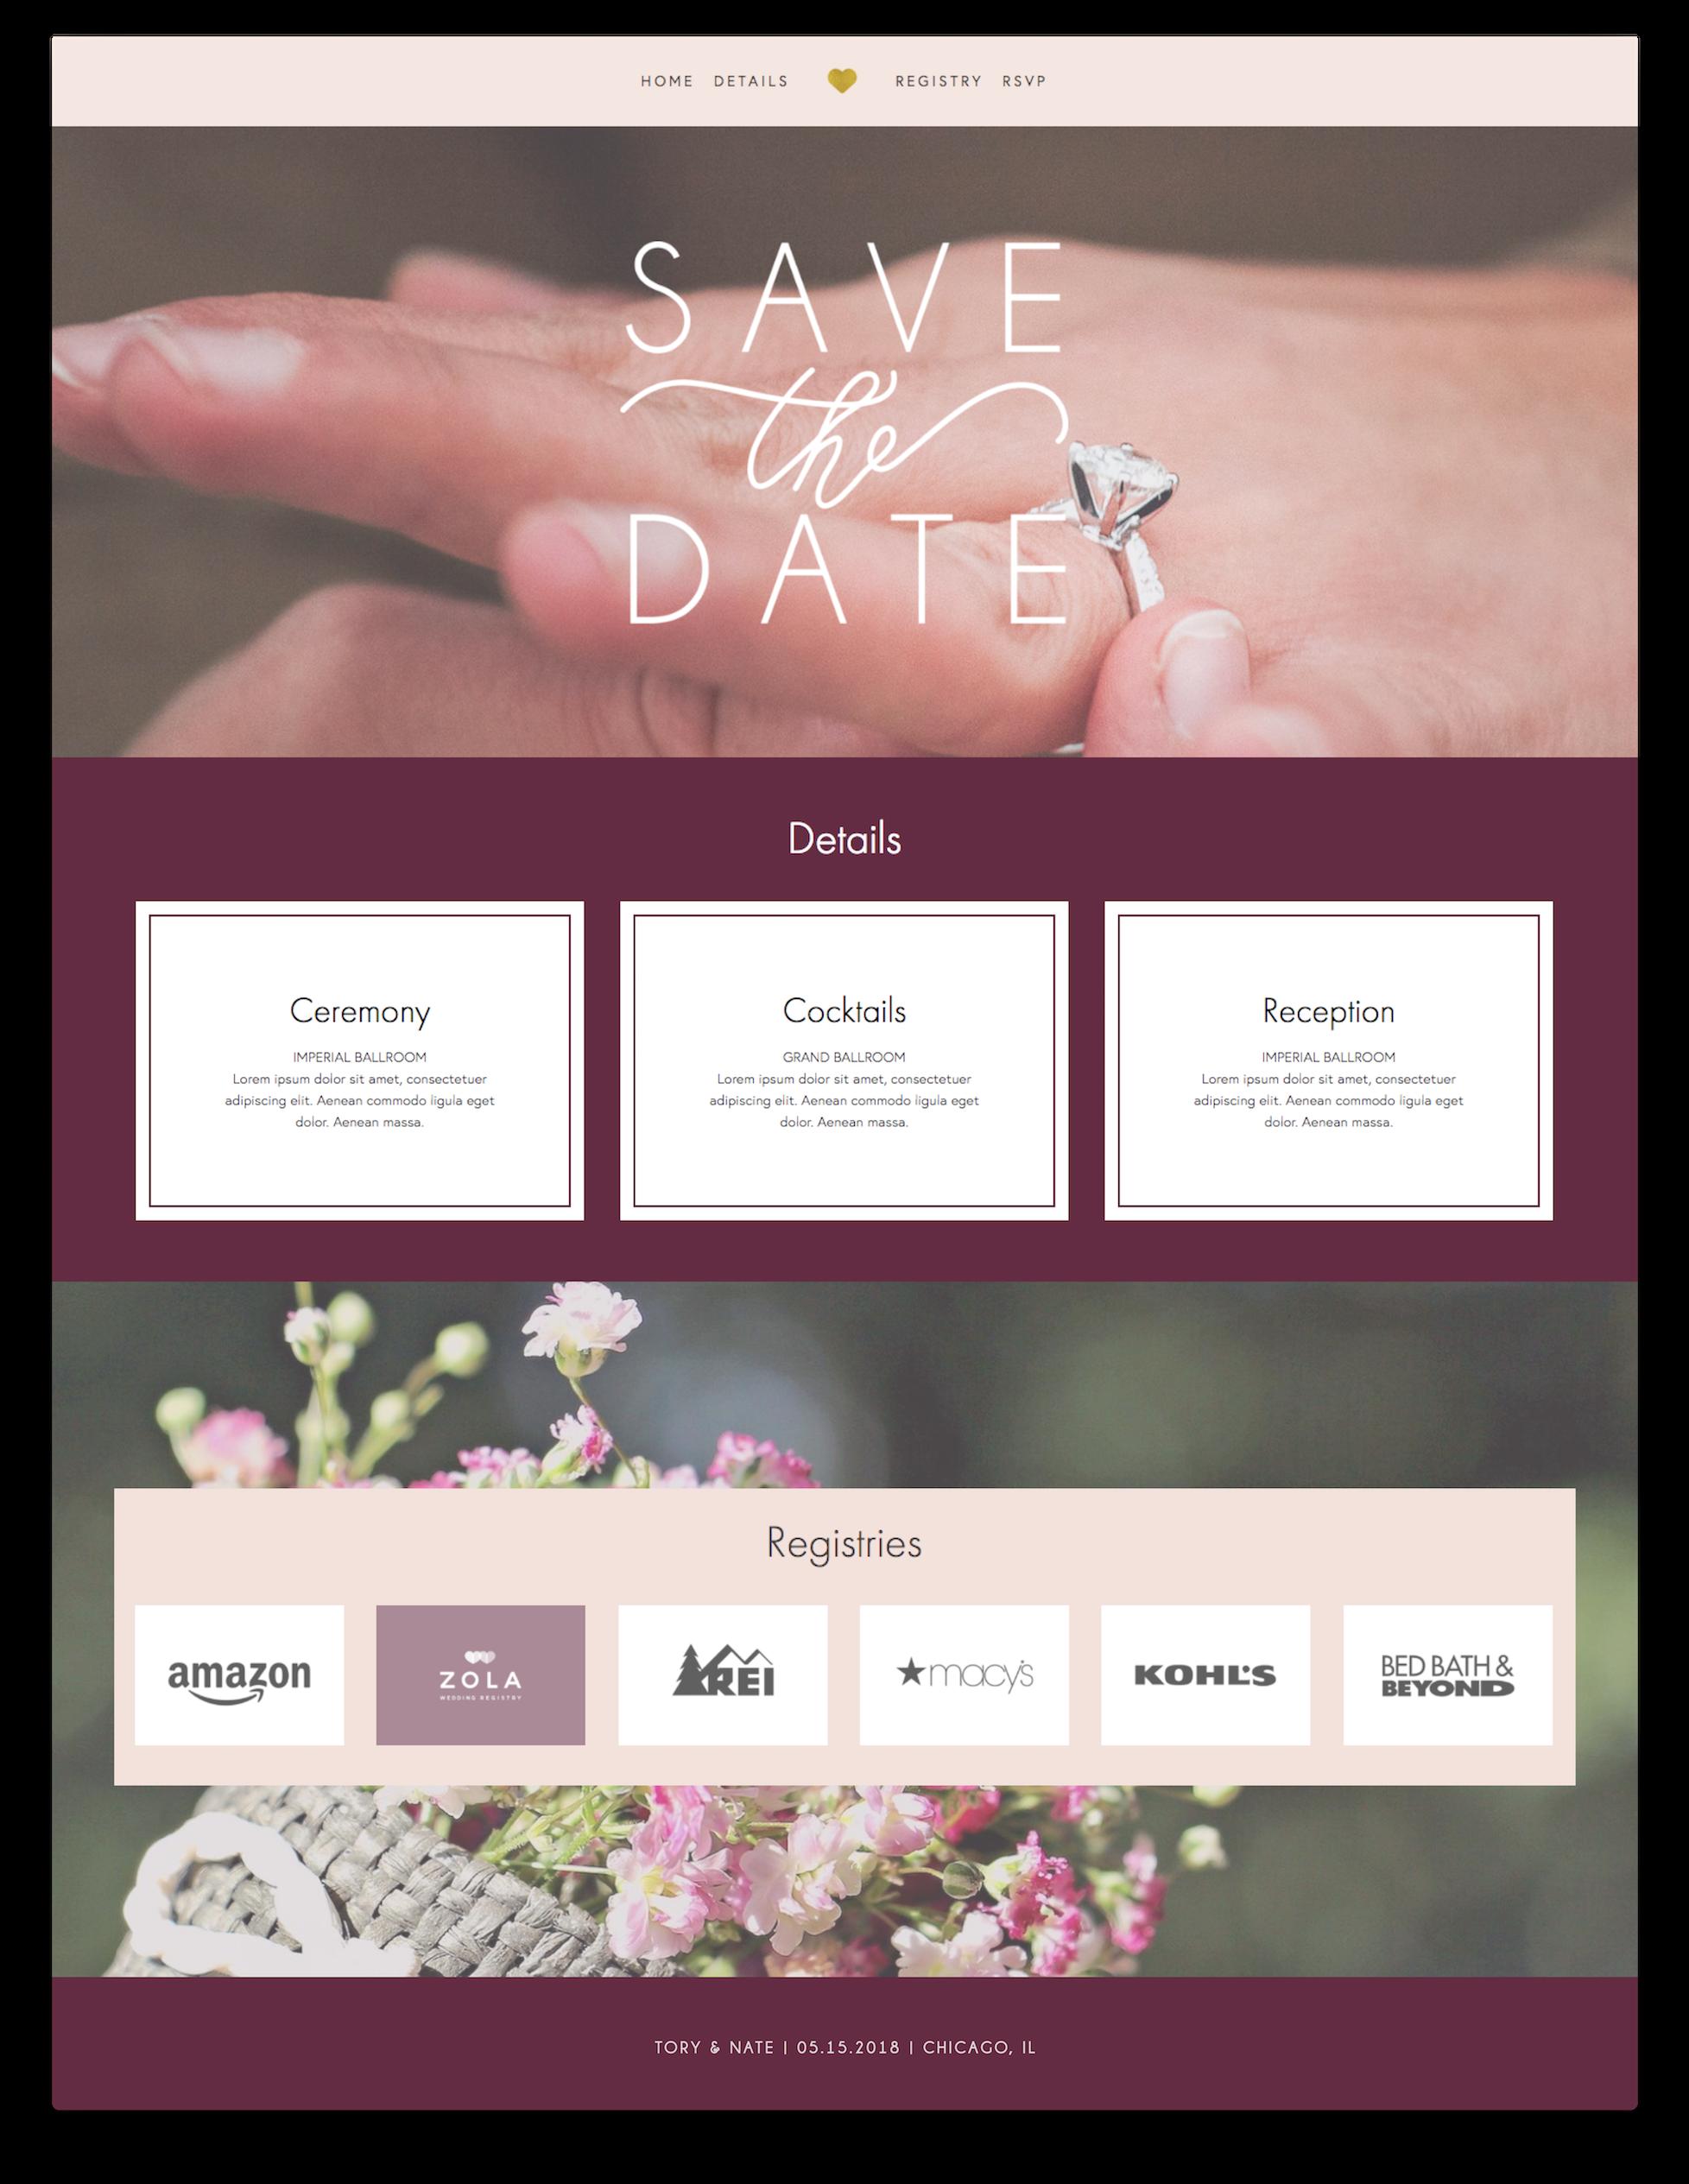 tory-nate-wedding-website